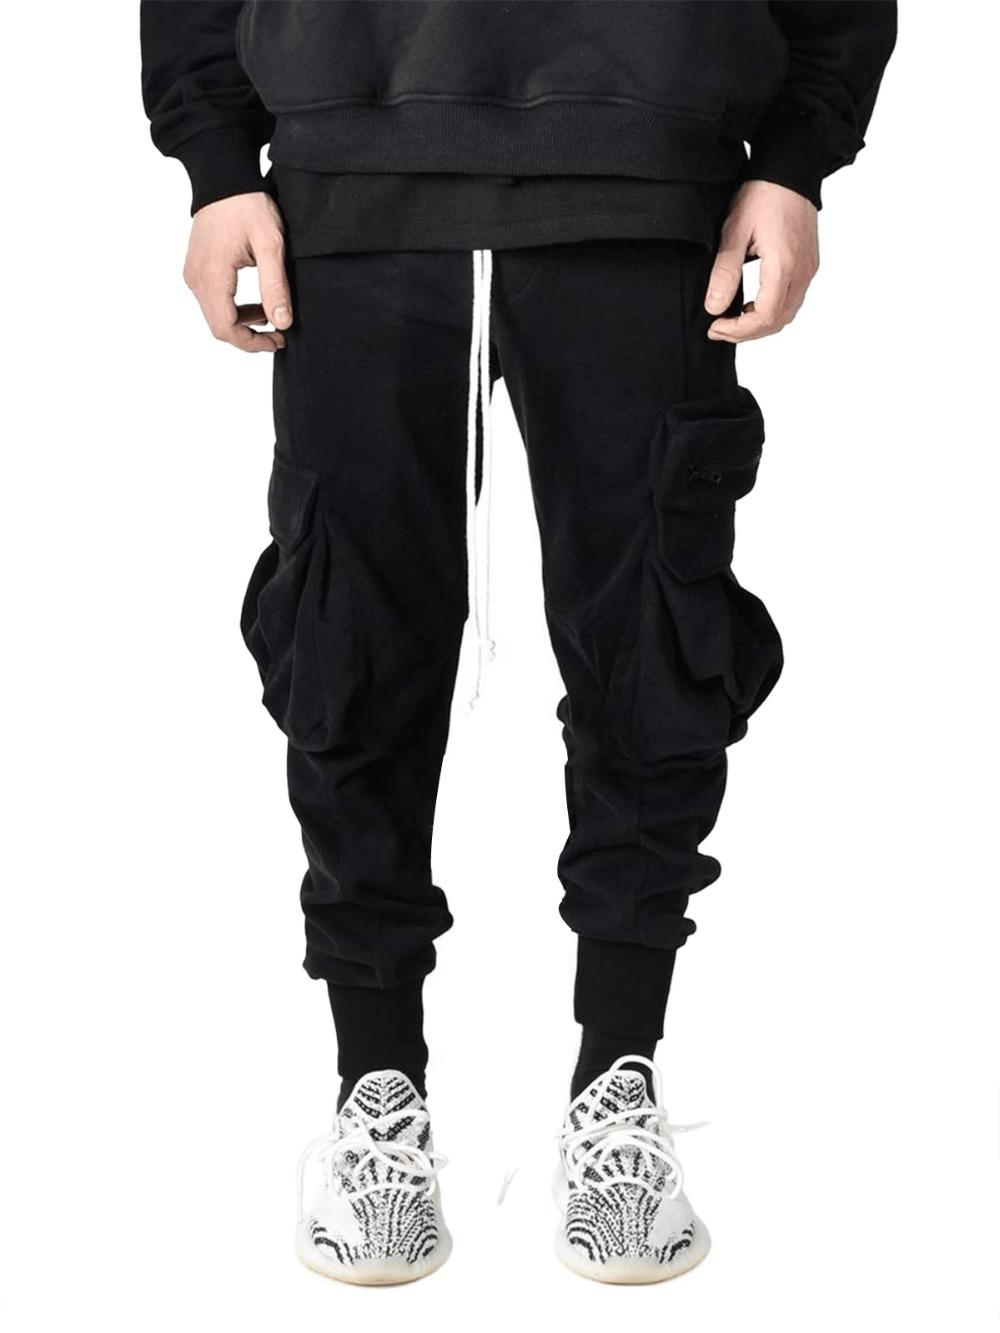 cargosweatpants-black_front_1200x1600